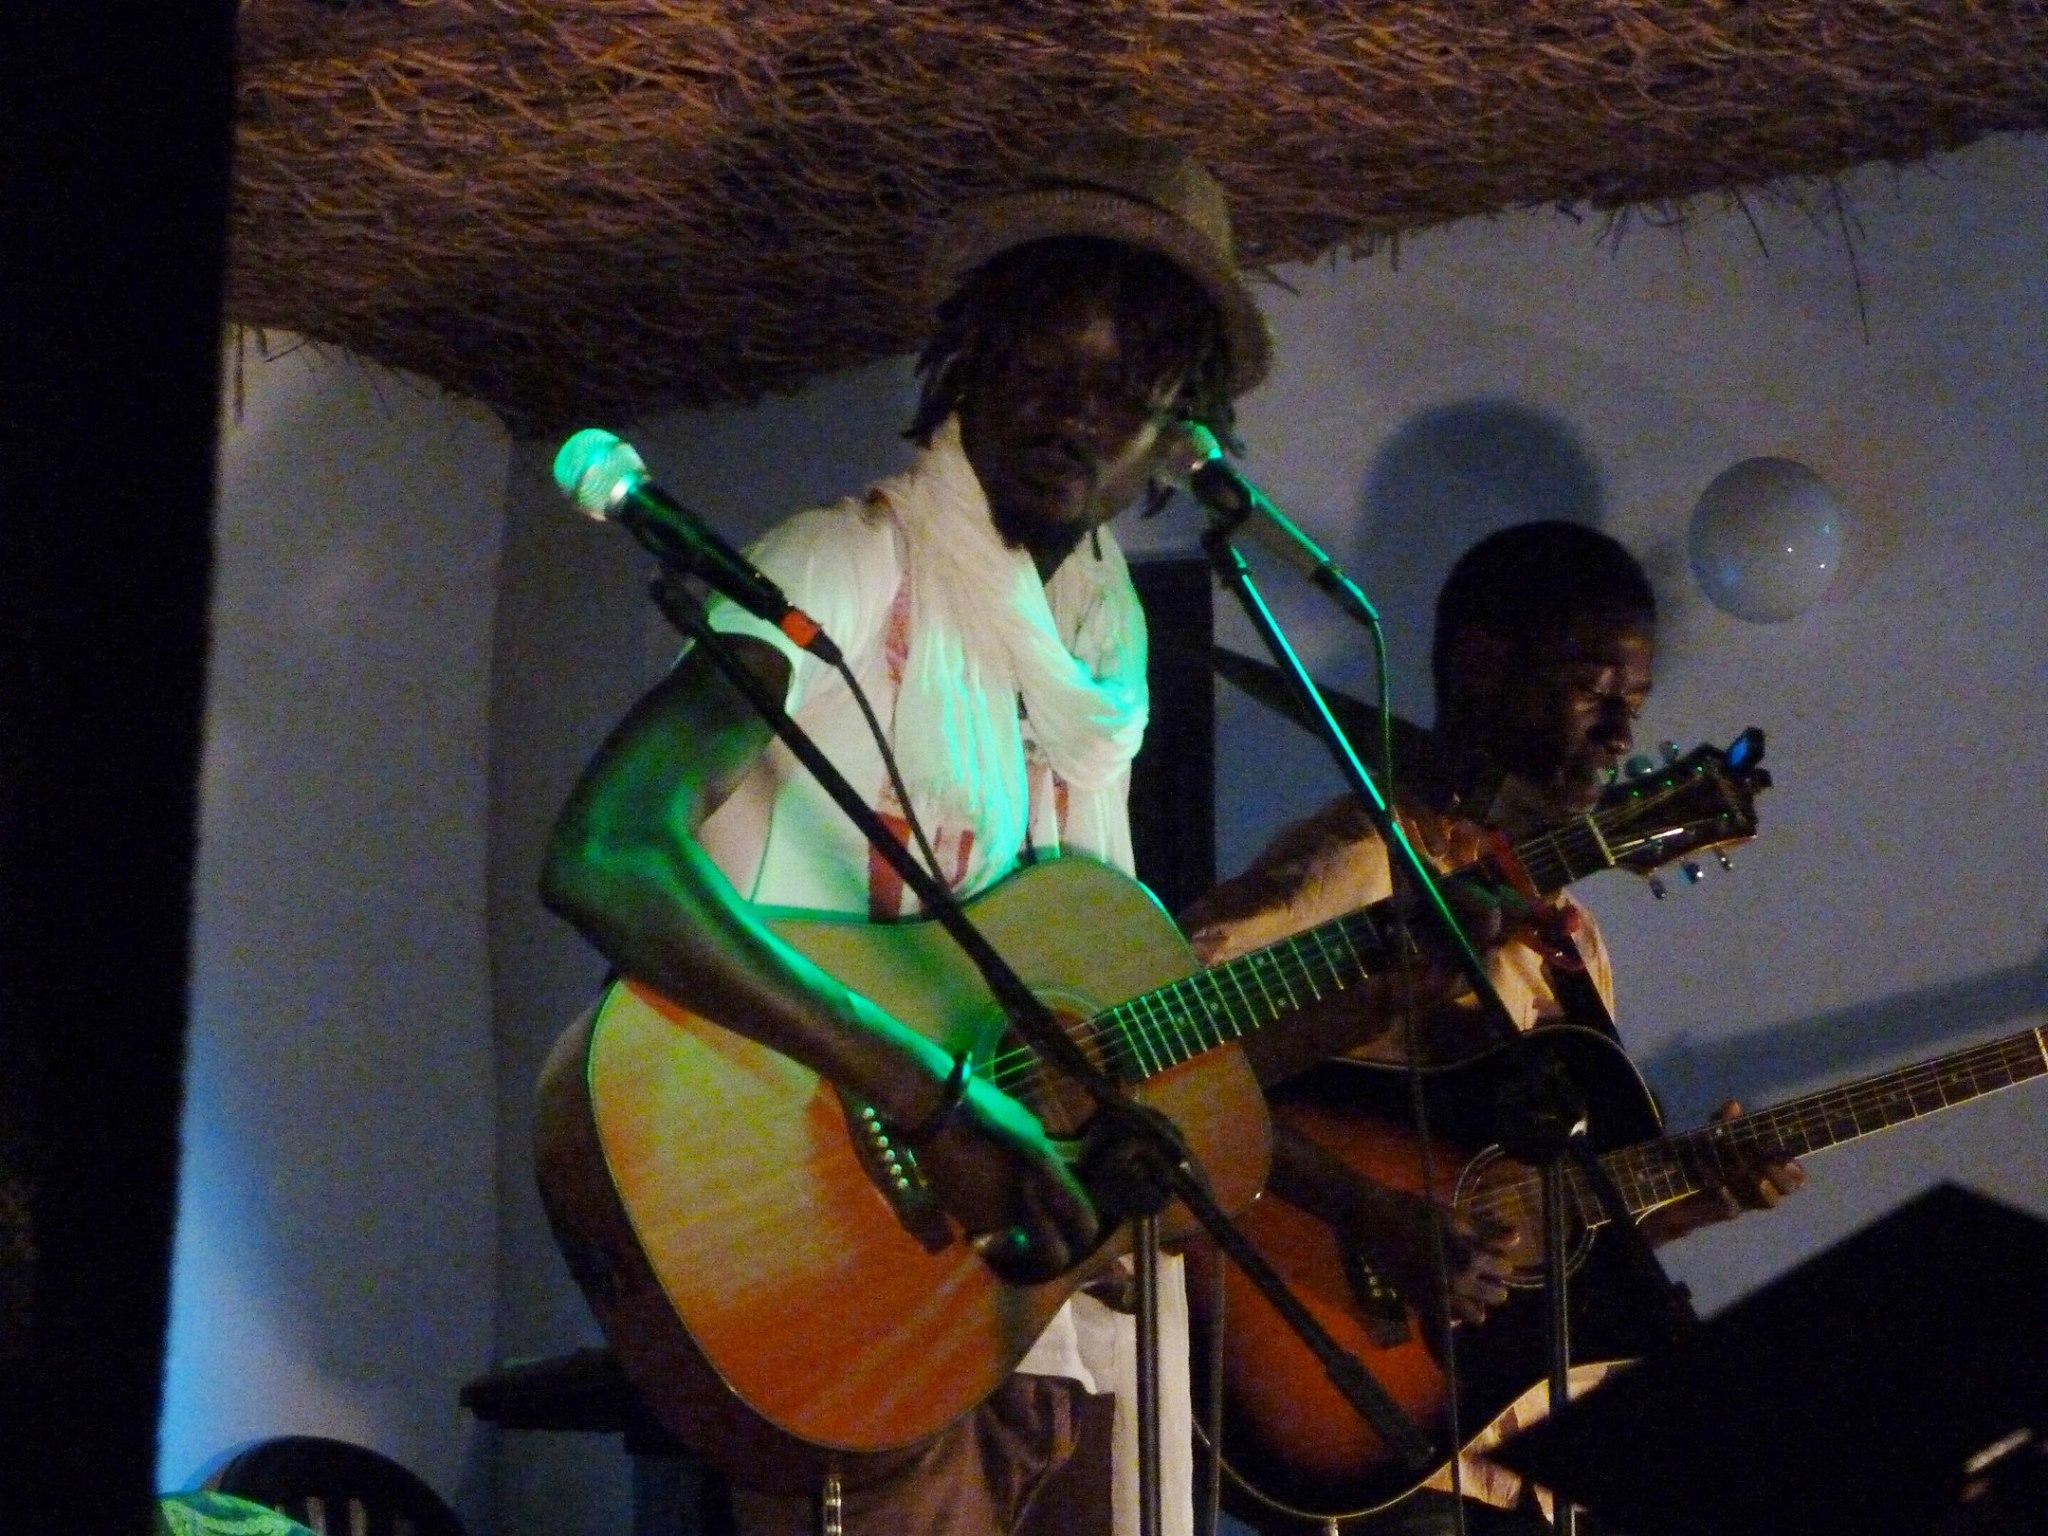 Concert LBK au Meyazz